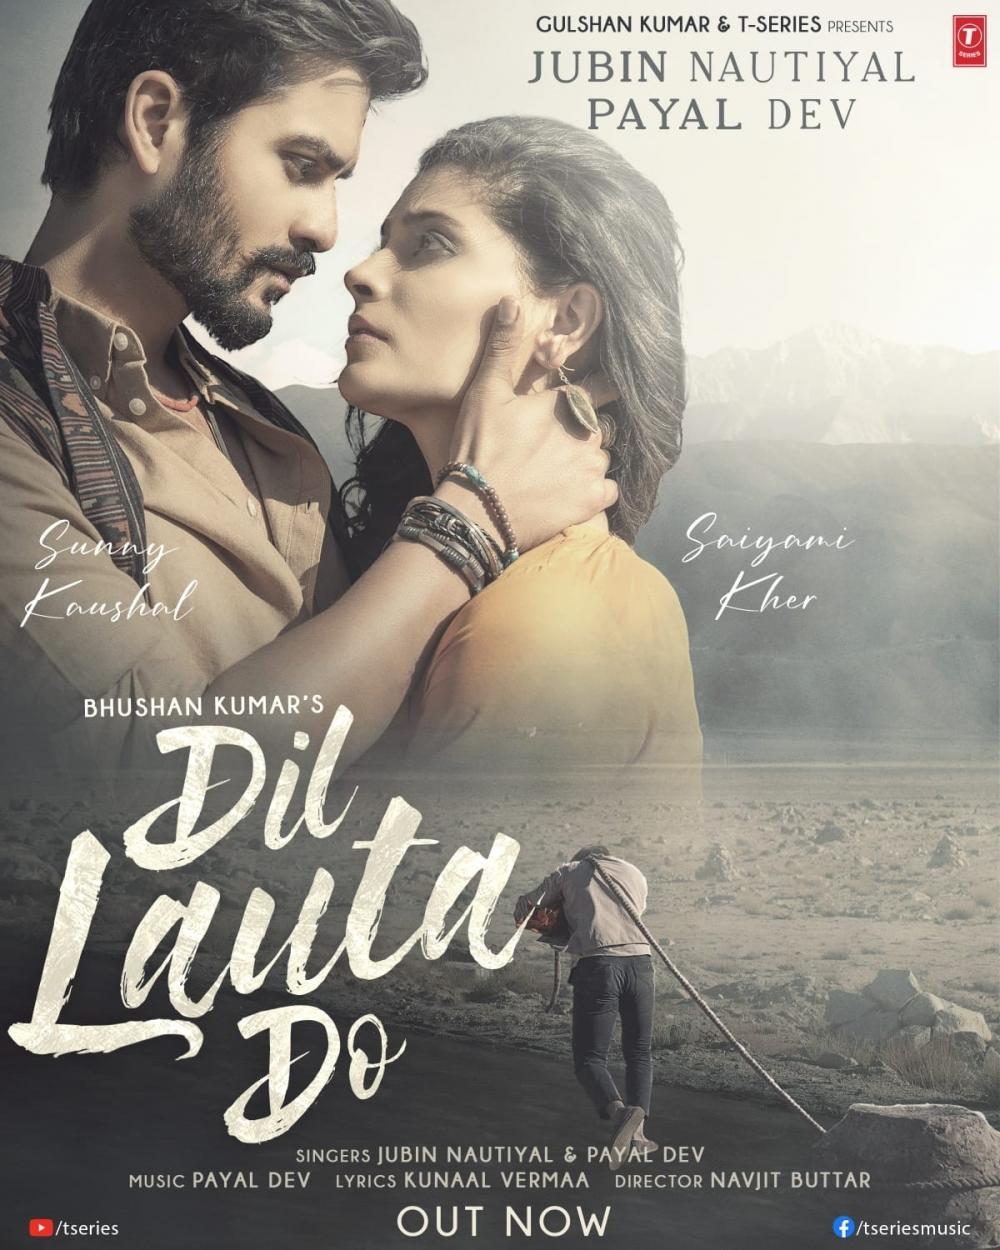 The Weekend Leader - Jubin Nautiyal, Payal Dev's single 'Dil lauta do' out